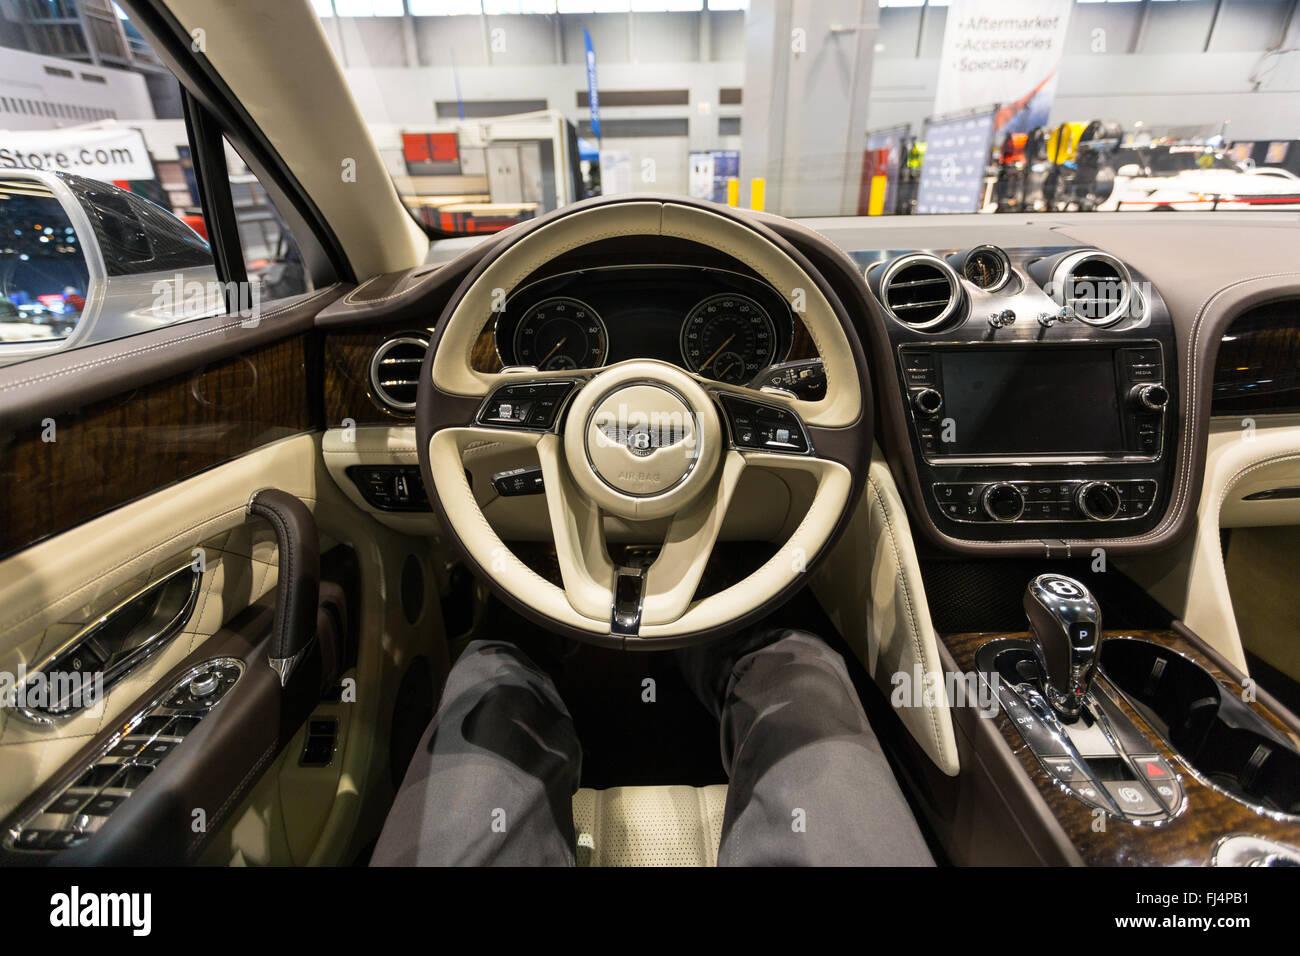 Bentley Bentayga Fotos E Imagenes De Stock Alamy